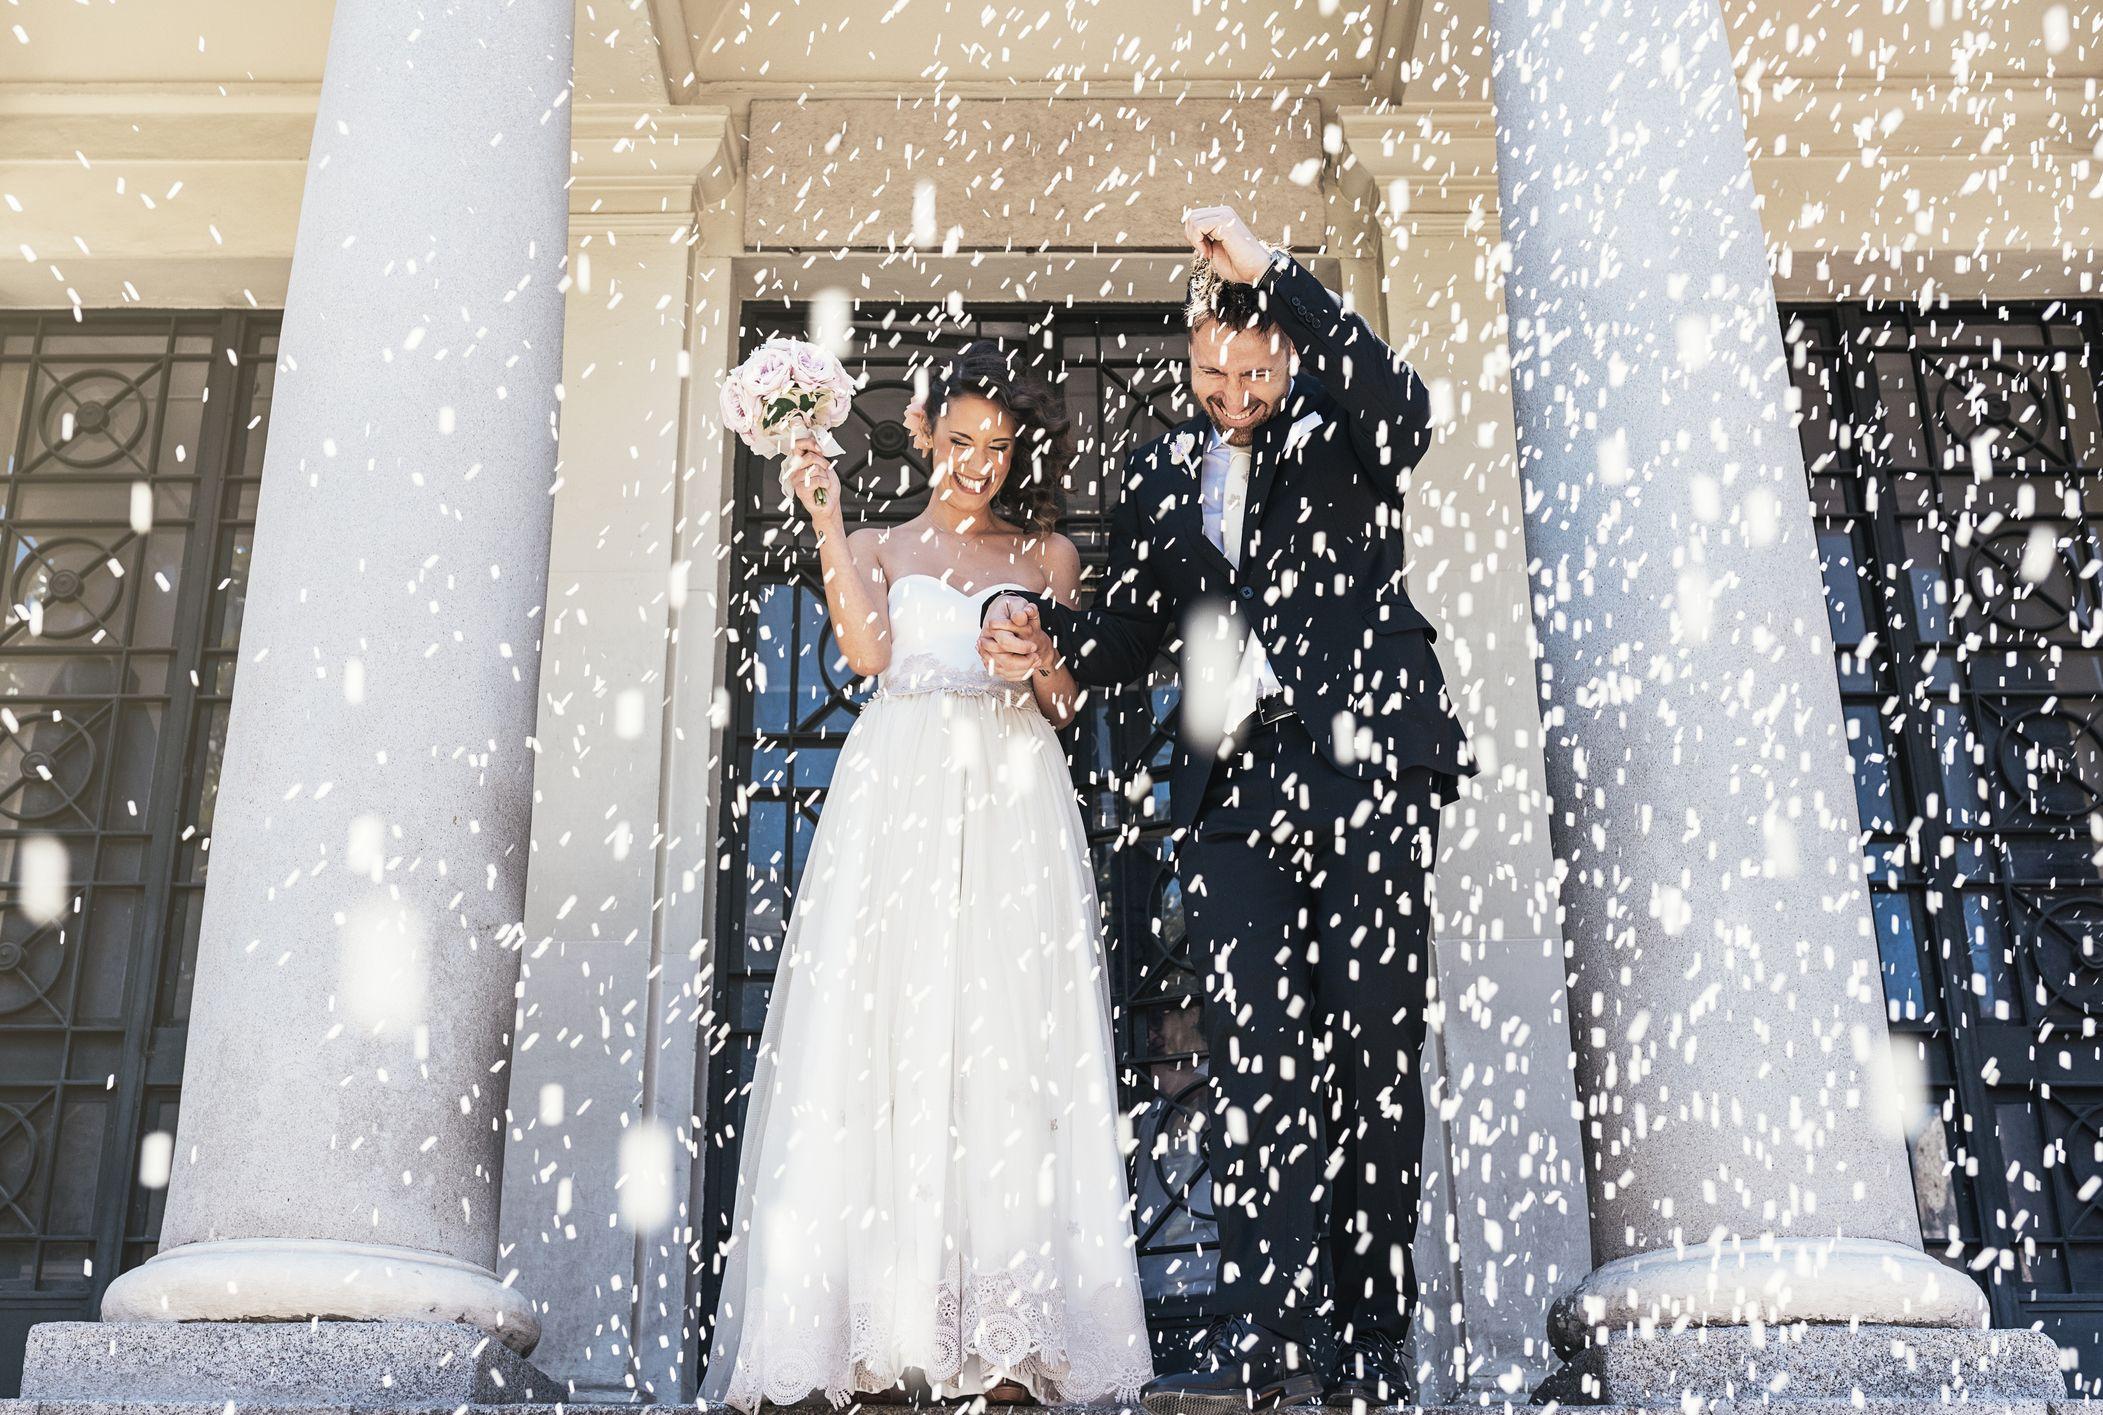 12 Unique Wedding Traditions Around the Globe